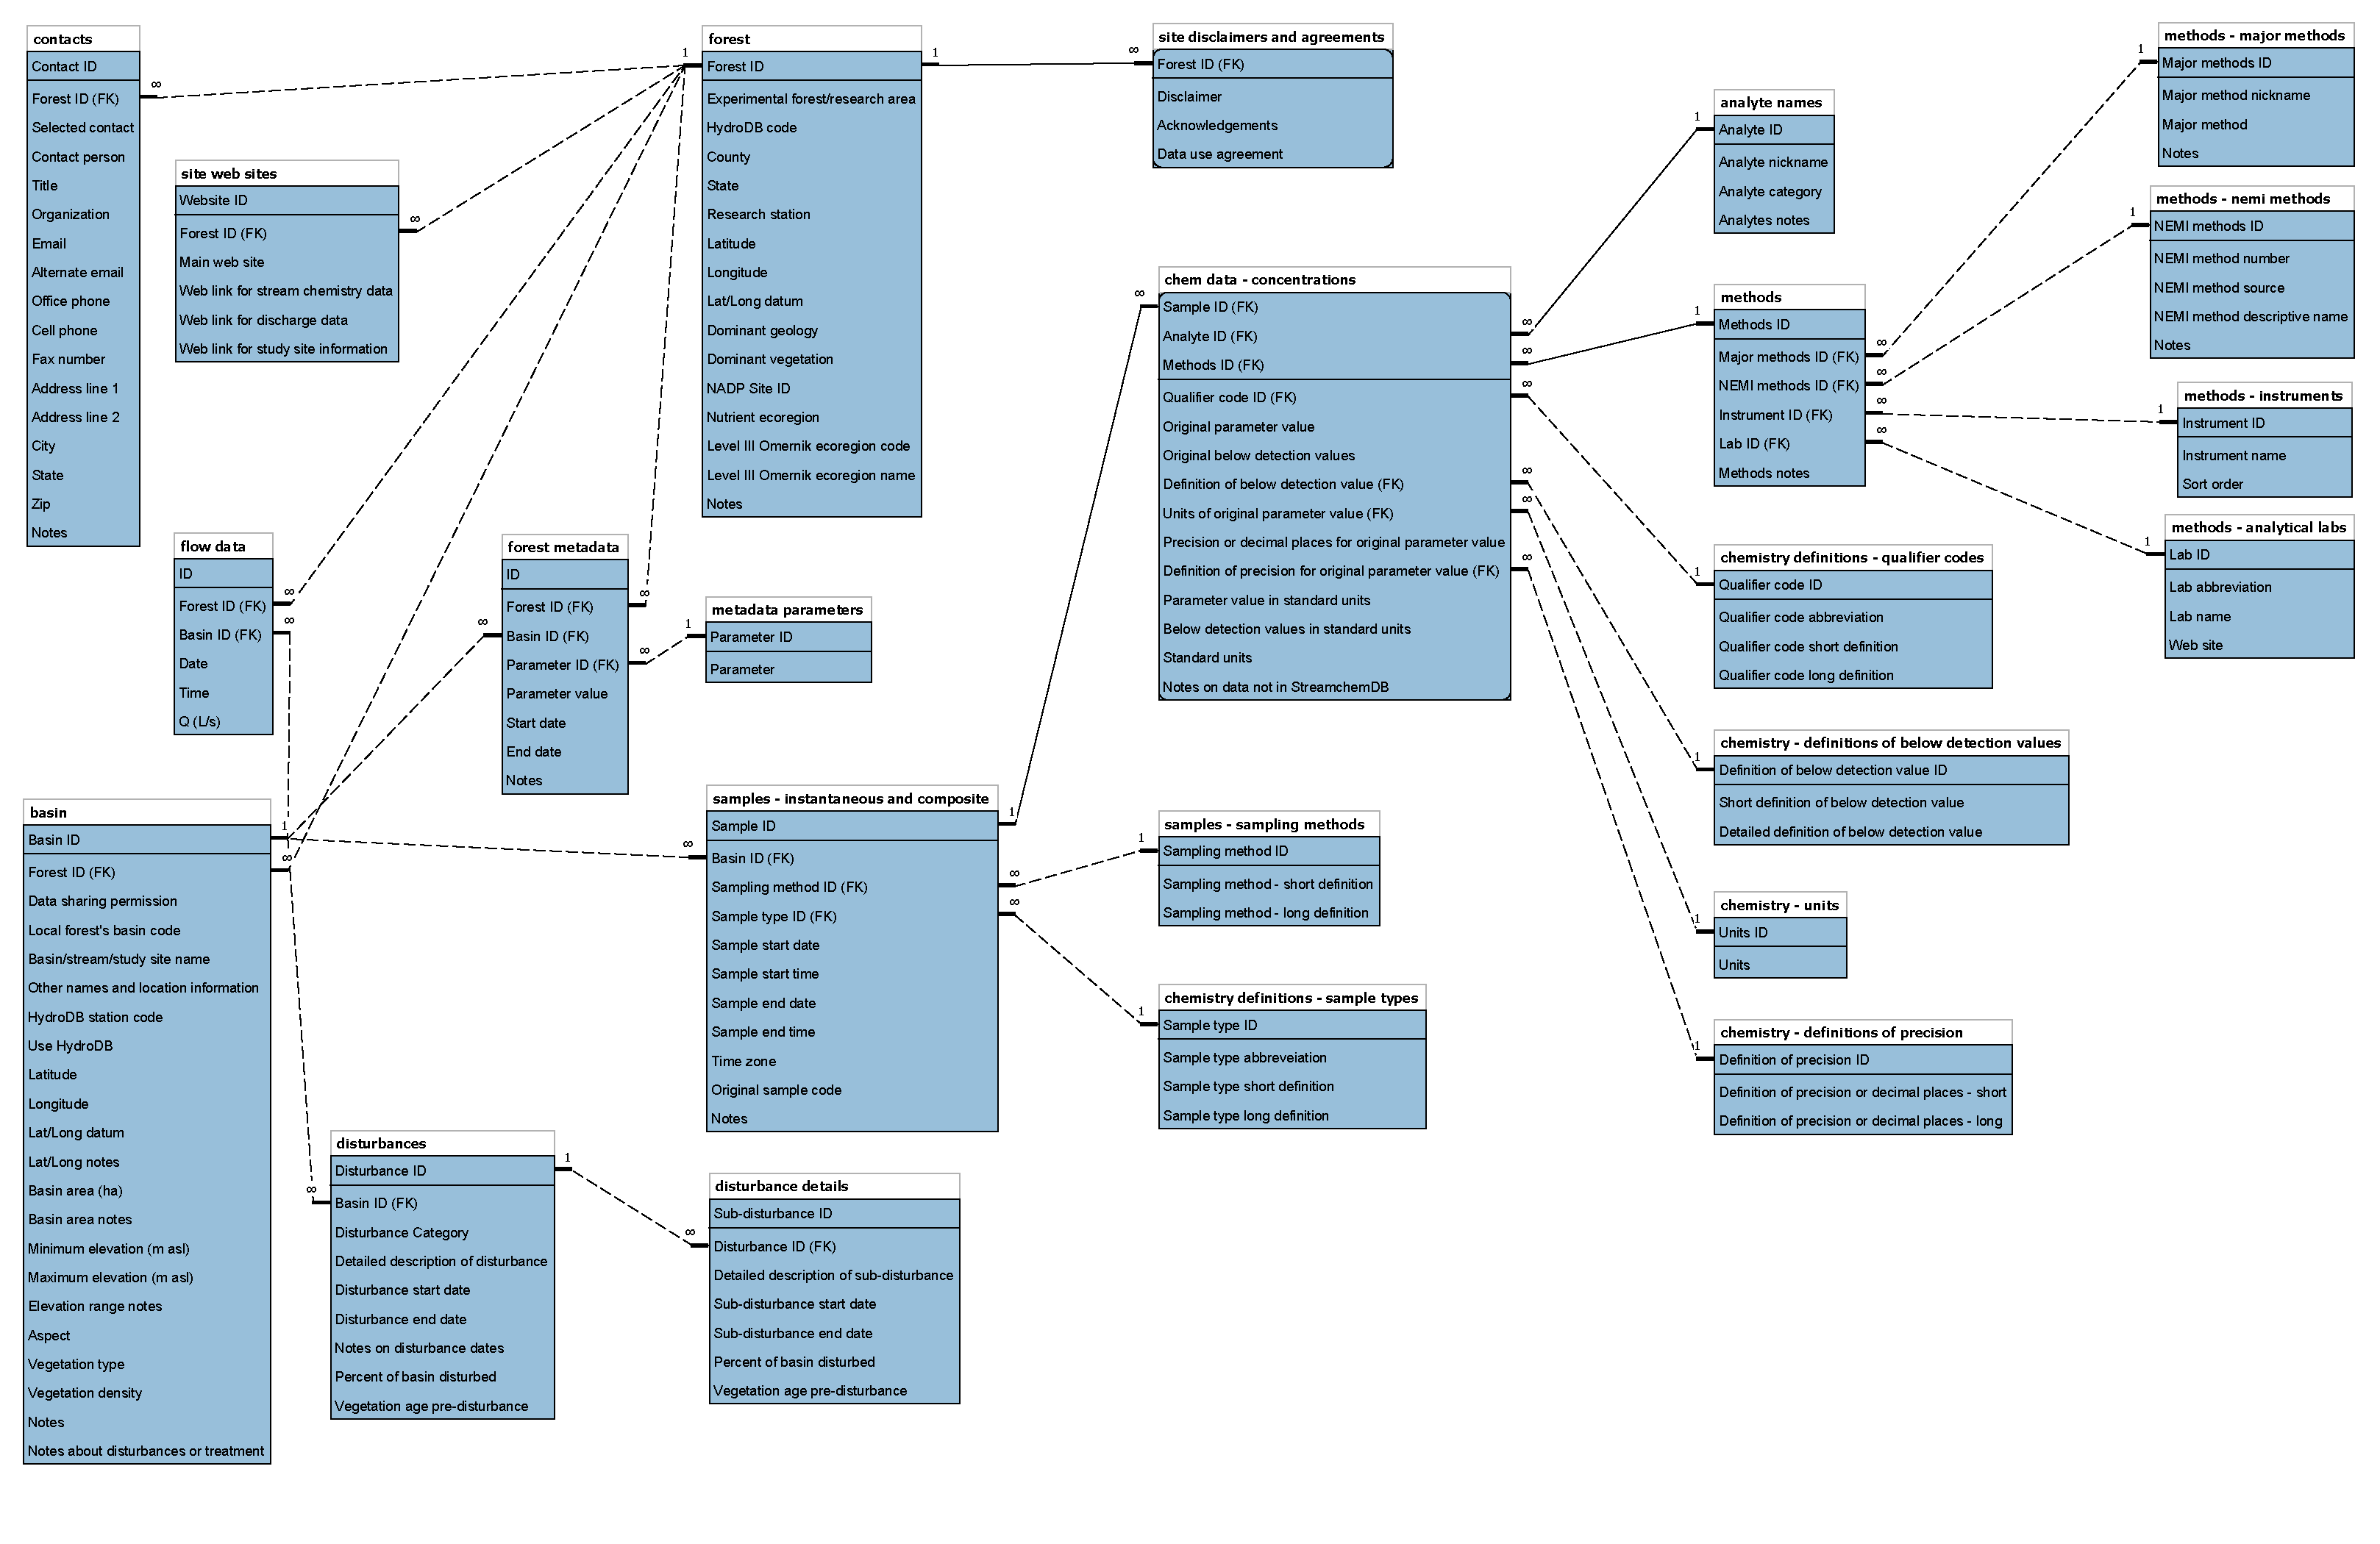 scdb_diagram-2013_08_16